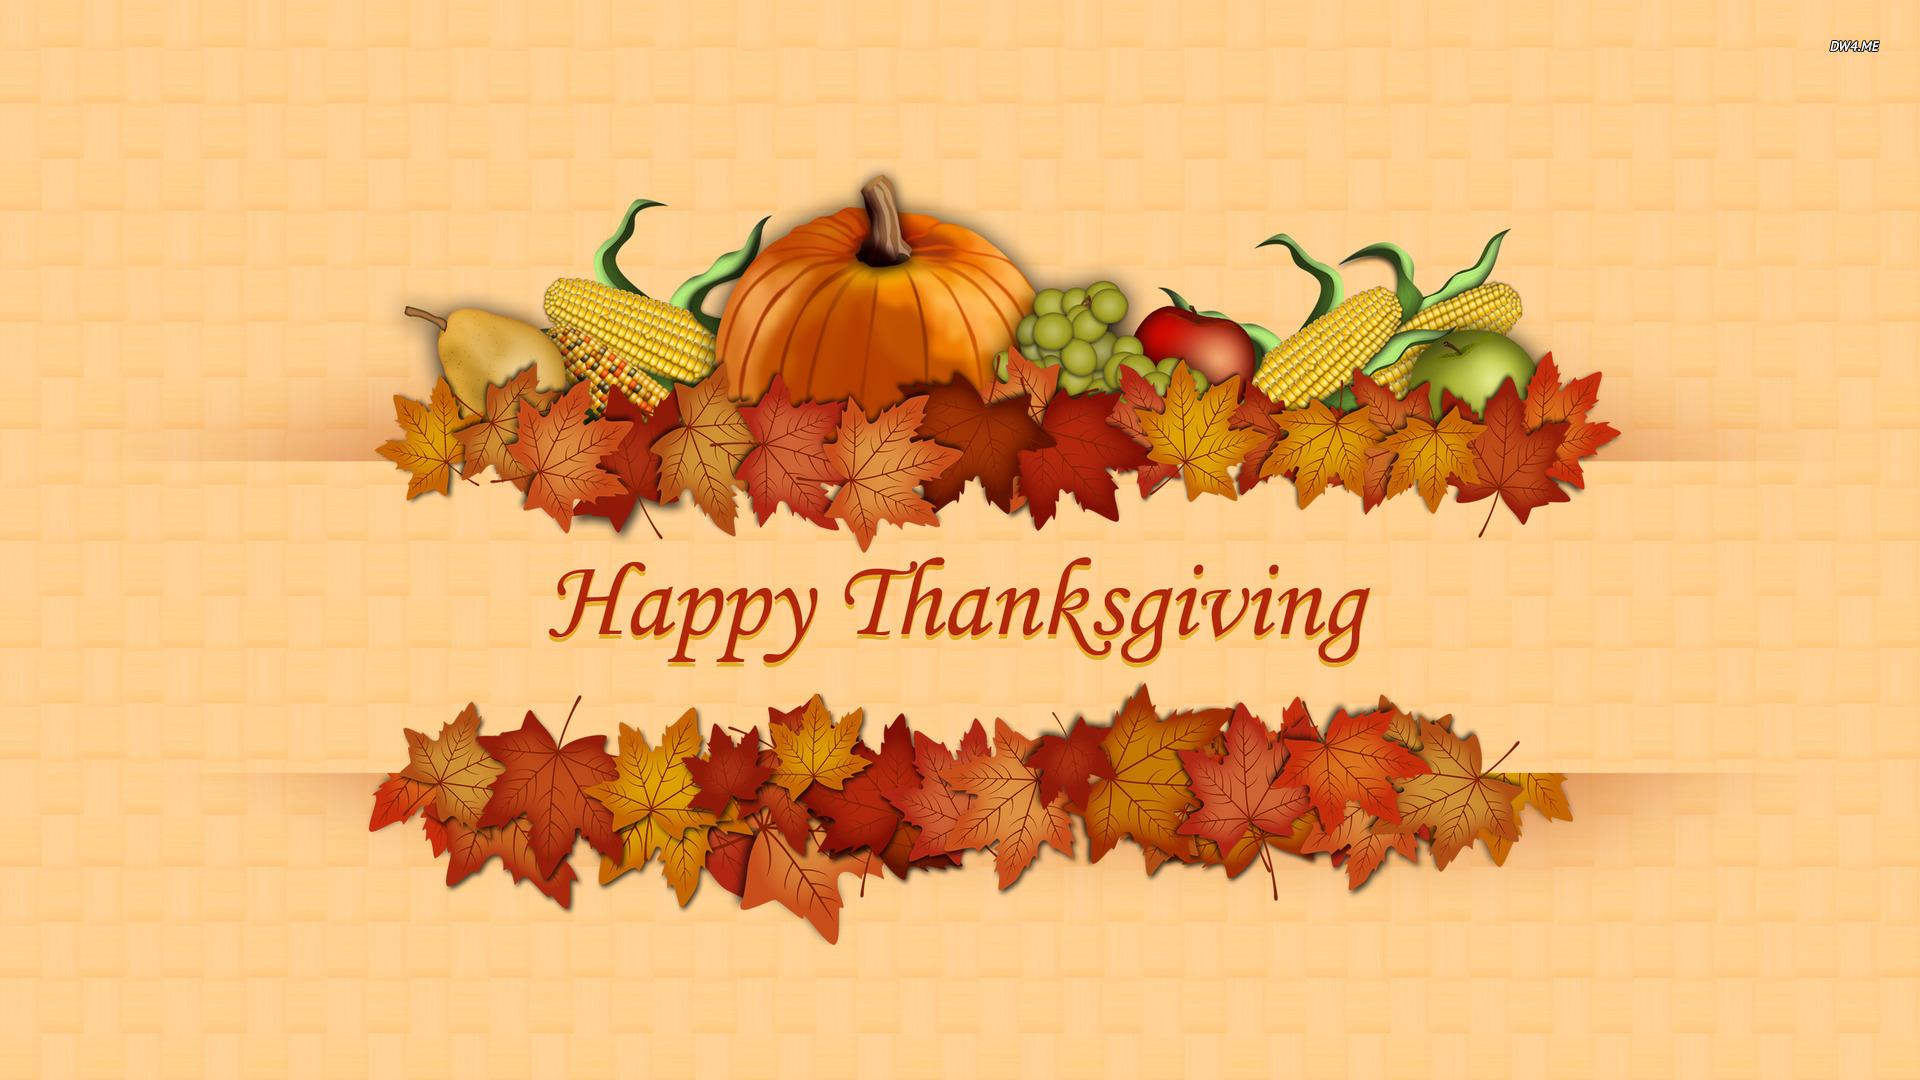 free thanksgiving desktop backgrounds